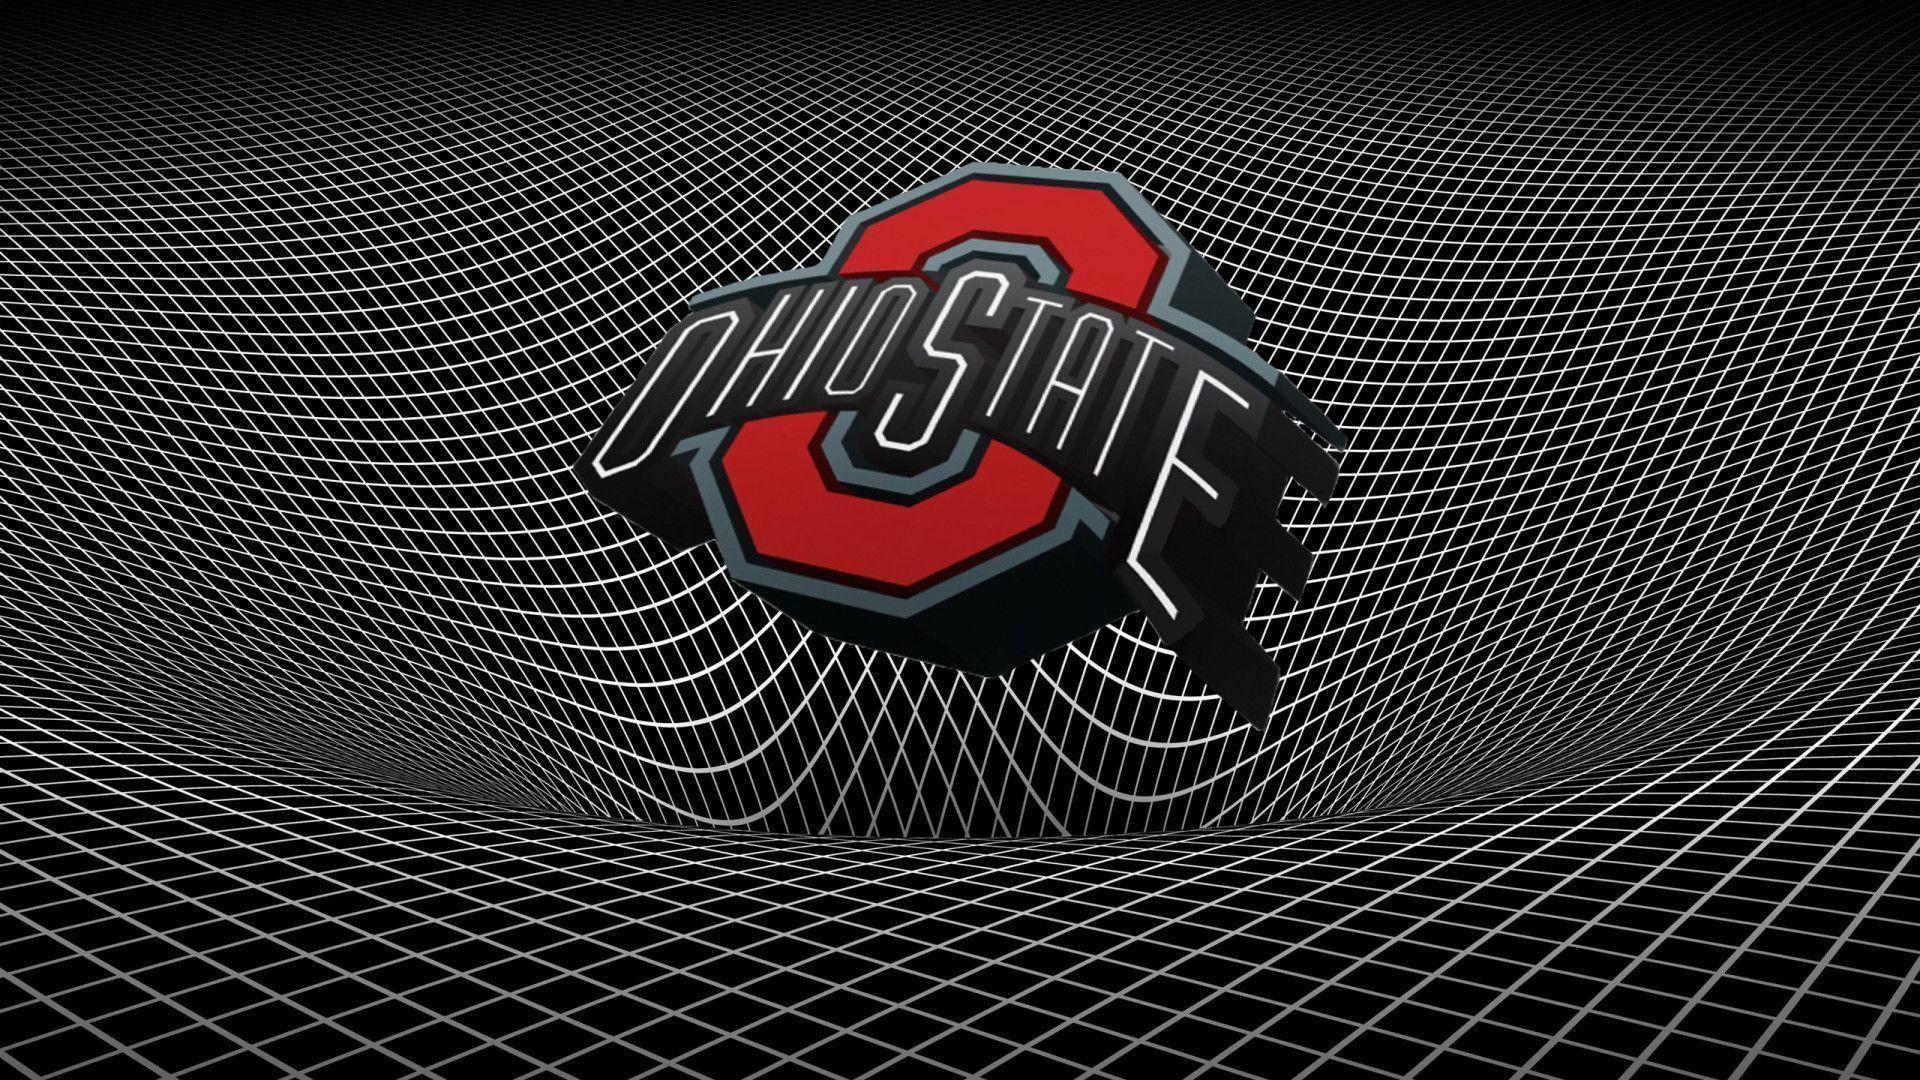 OSU Wallpaper 204 – Ohio State Football Wallpaper (29088622) – Fanpop